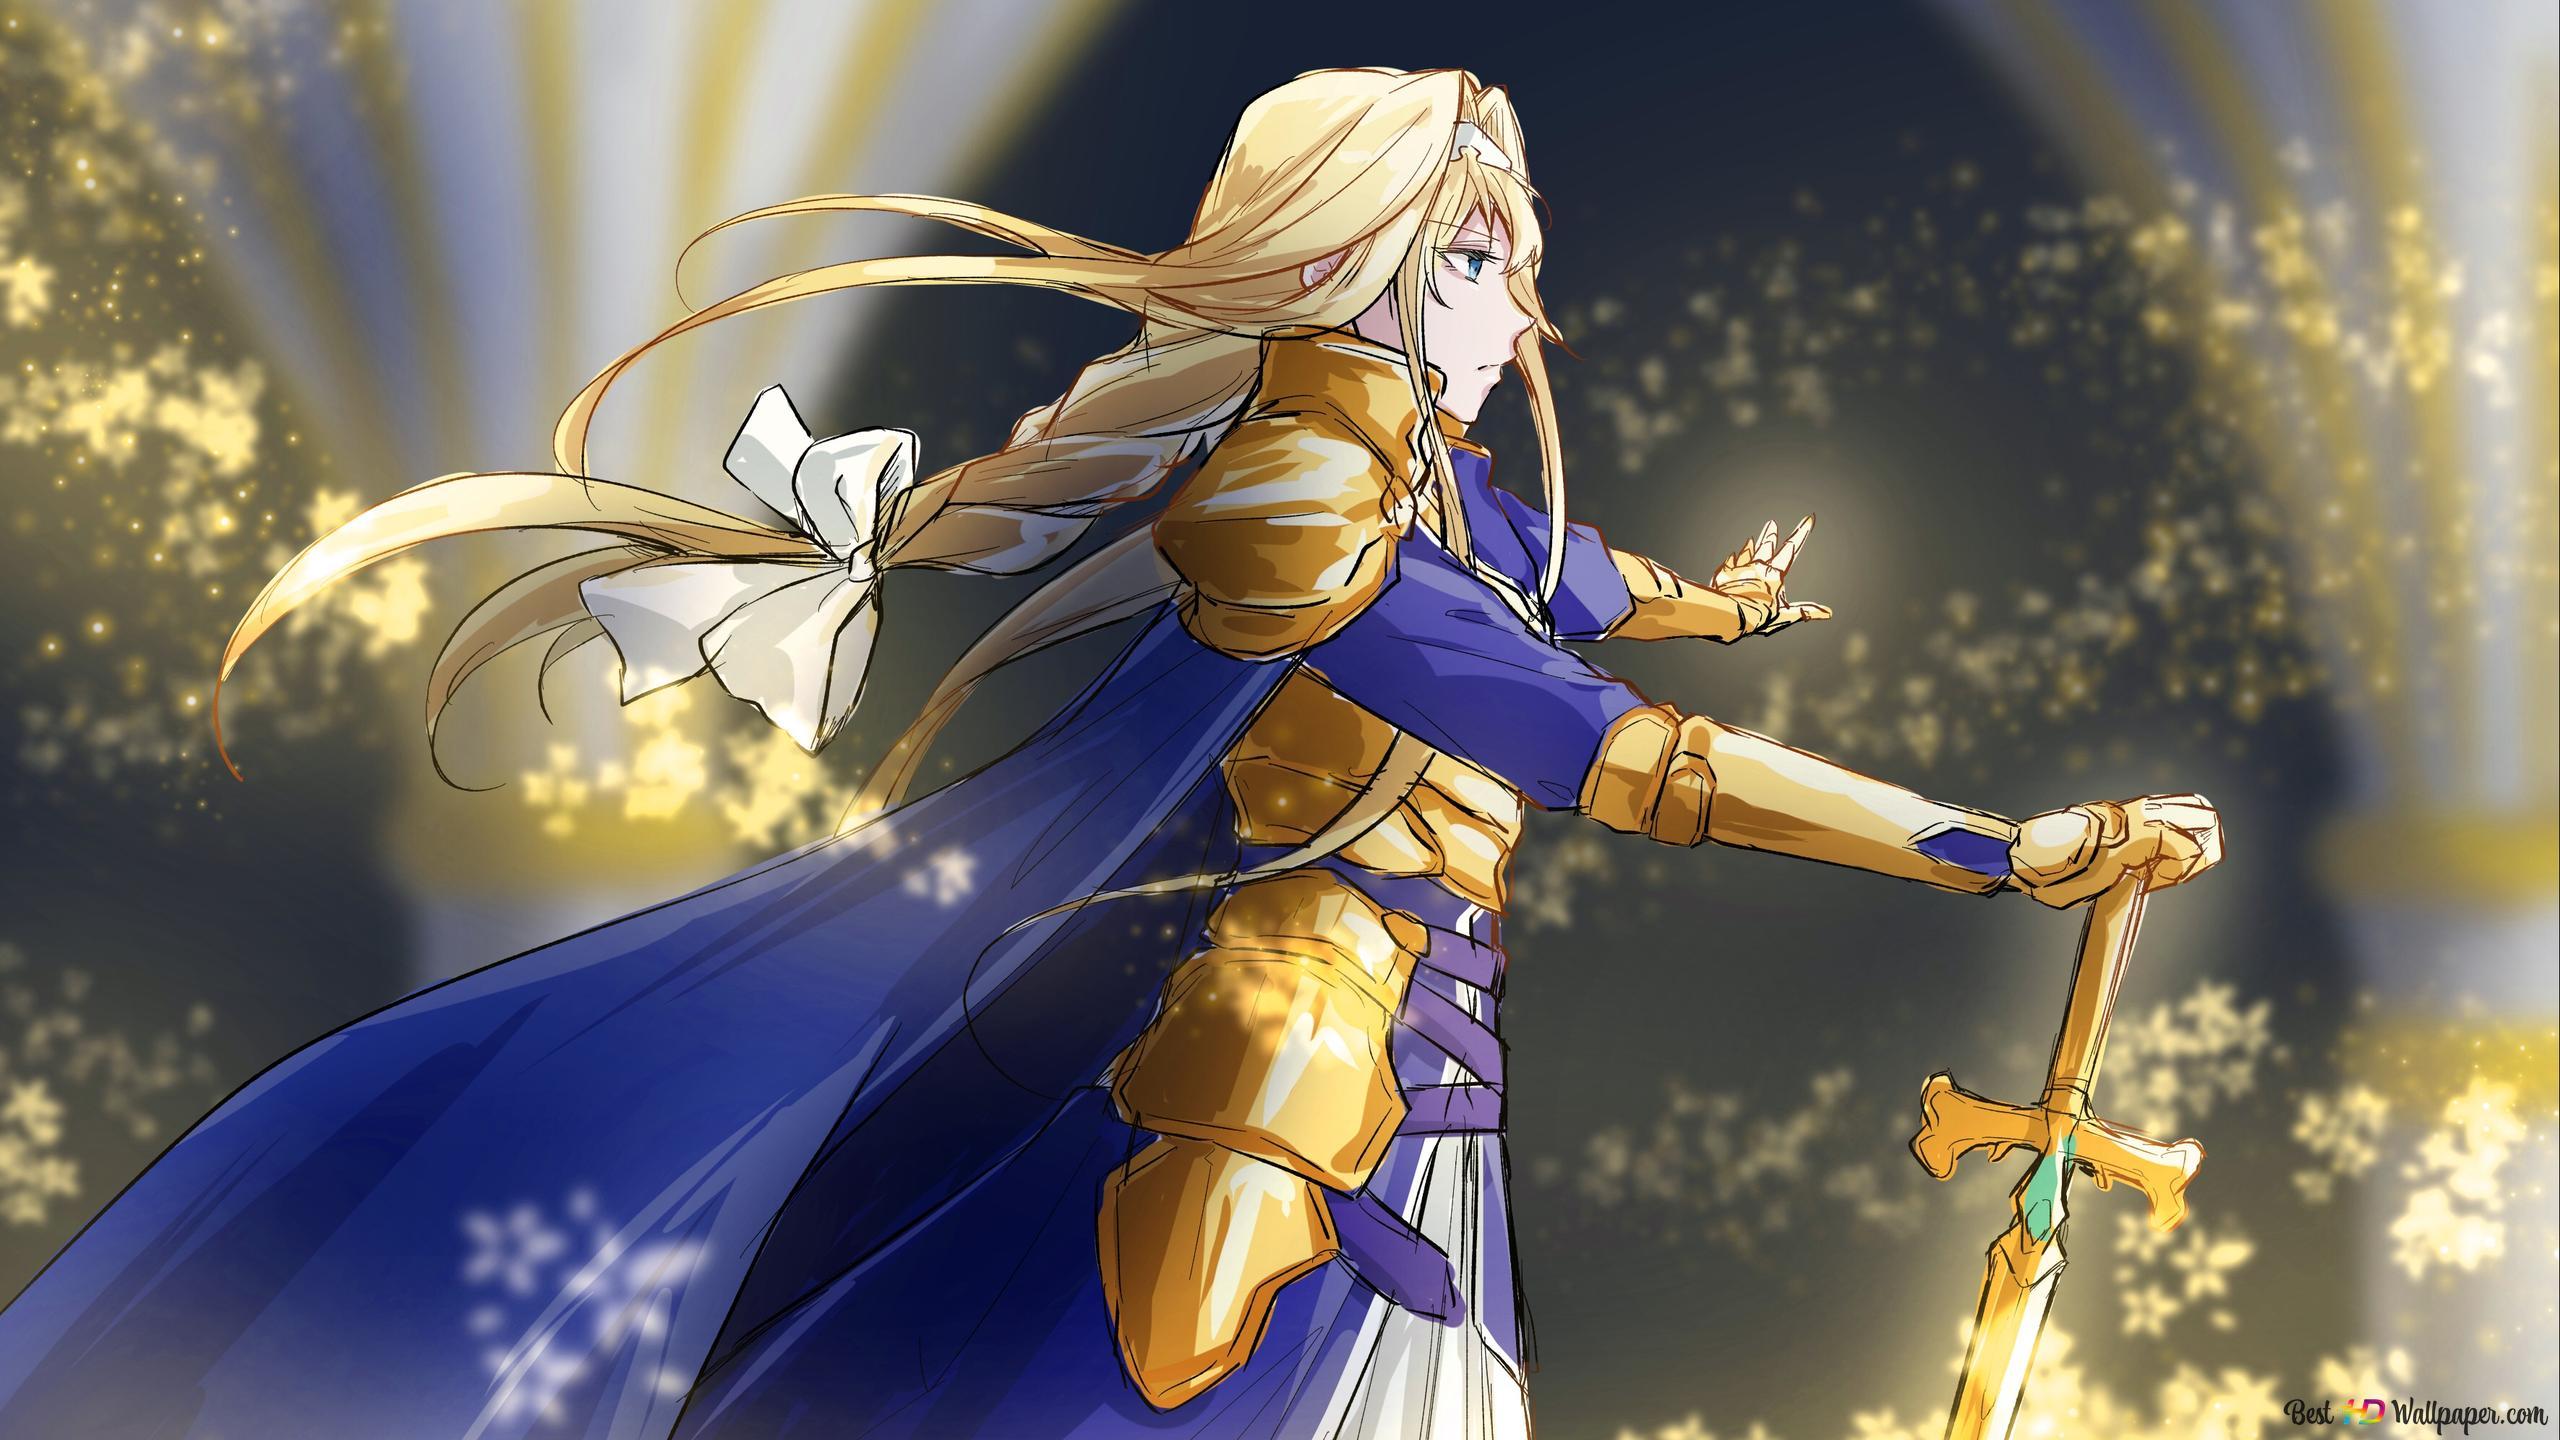 Sword Art Online Alicization Alice Zuberg Golden Knight Hd